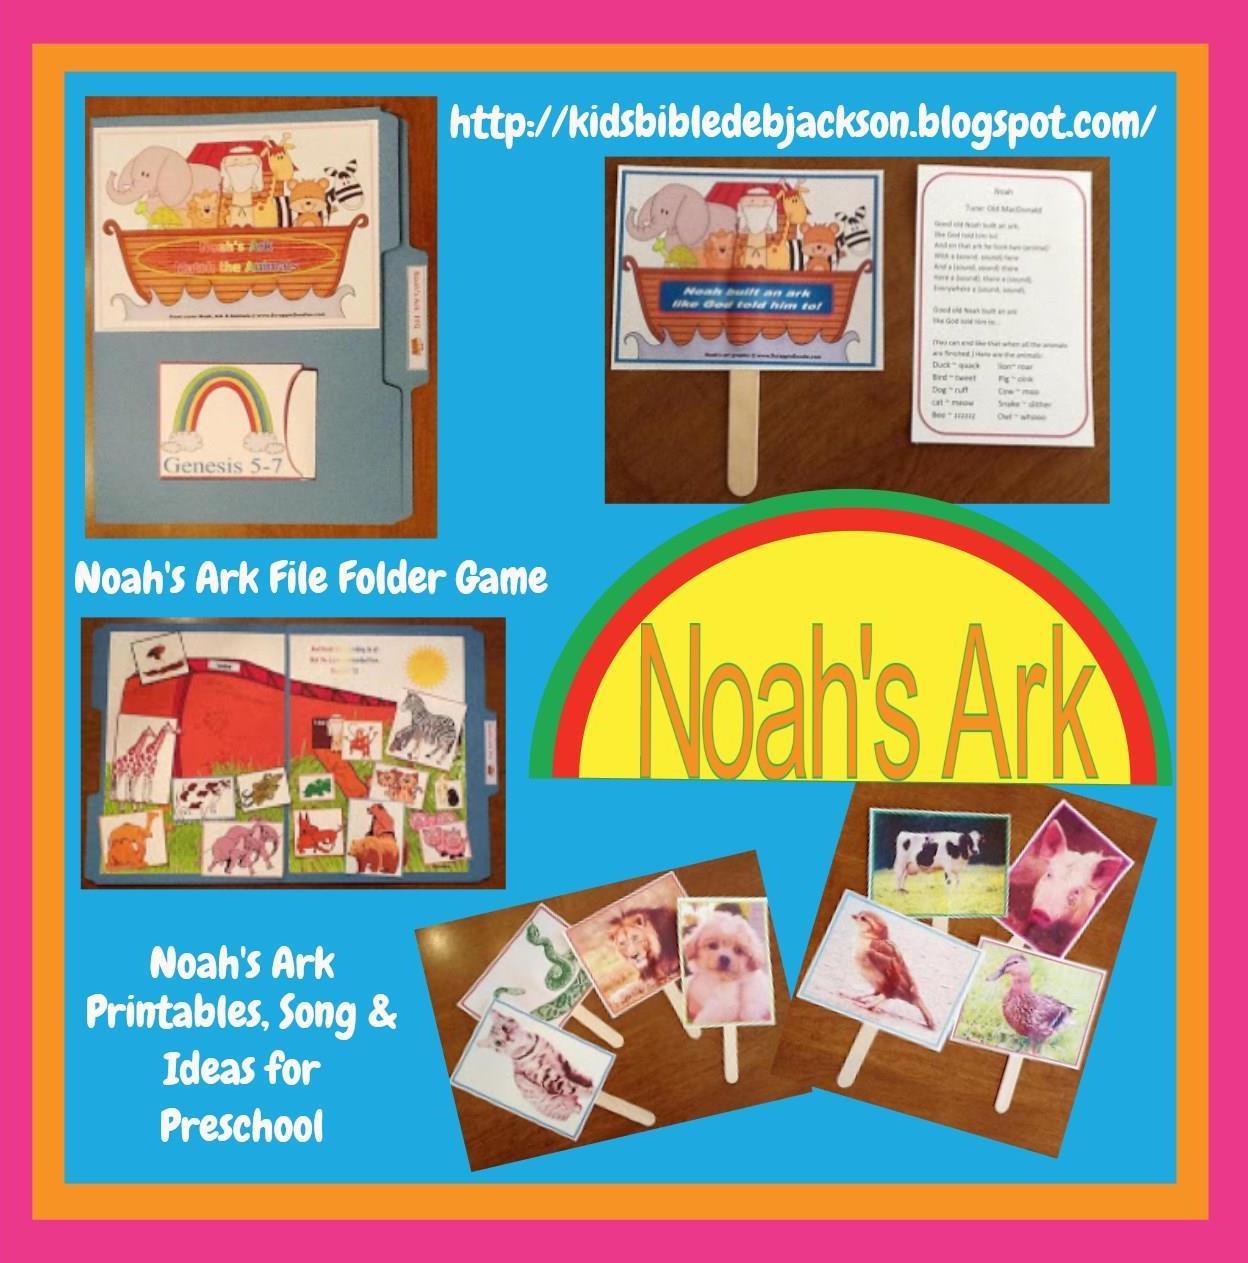 bible fun for kids noah u0027s ark ffg song u0026 more for preschool